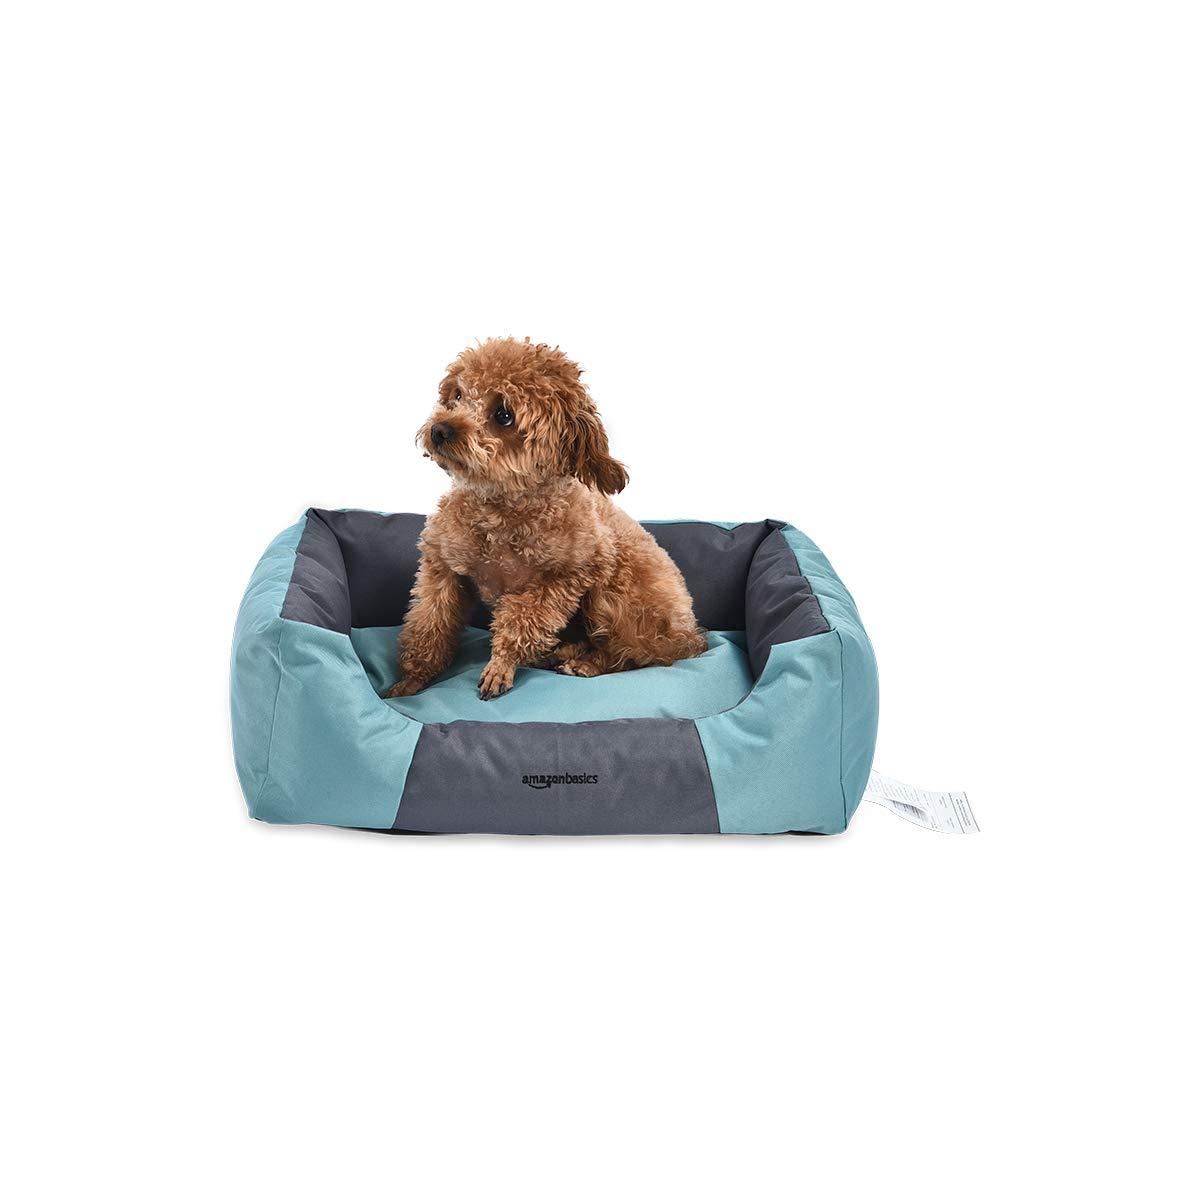 Amazon Basics Water-Resistant Pet Bed, Rectangular